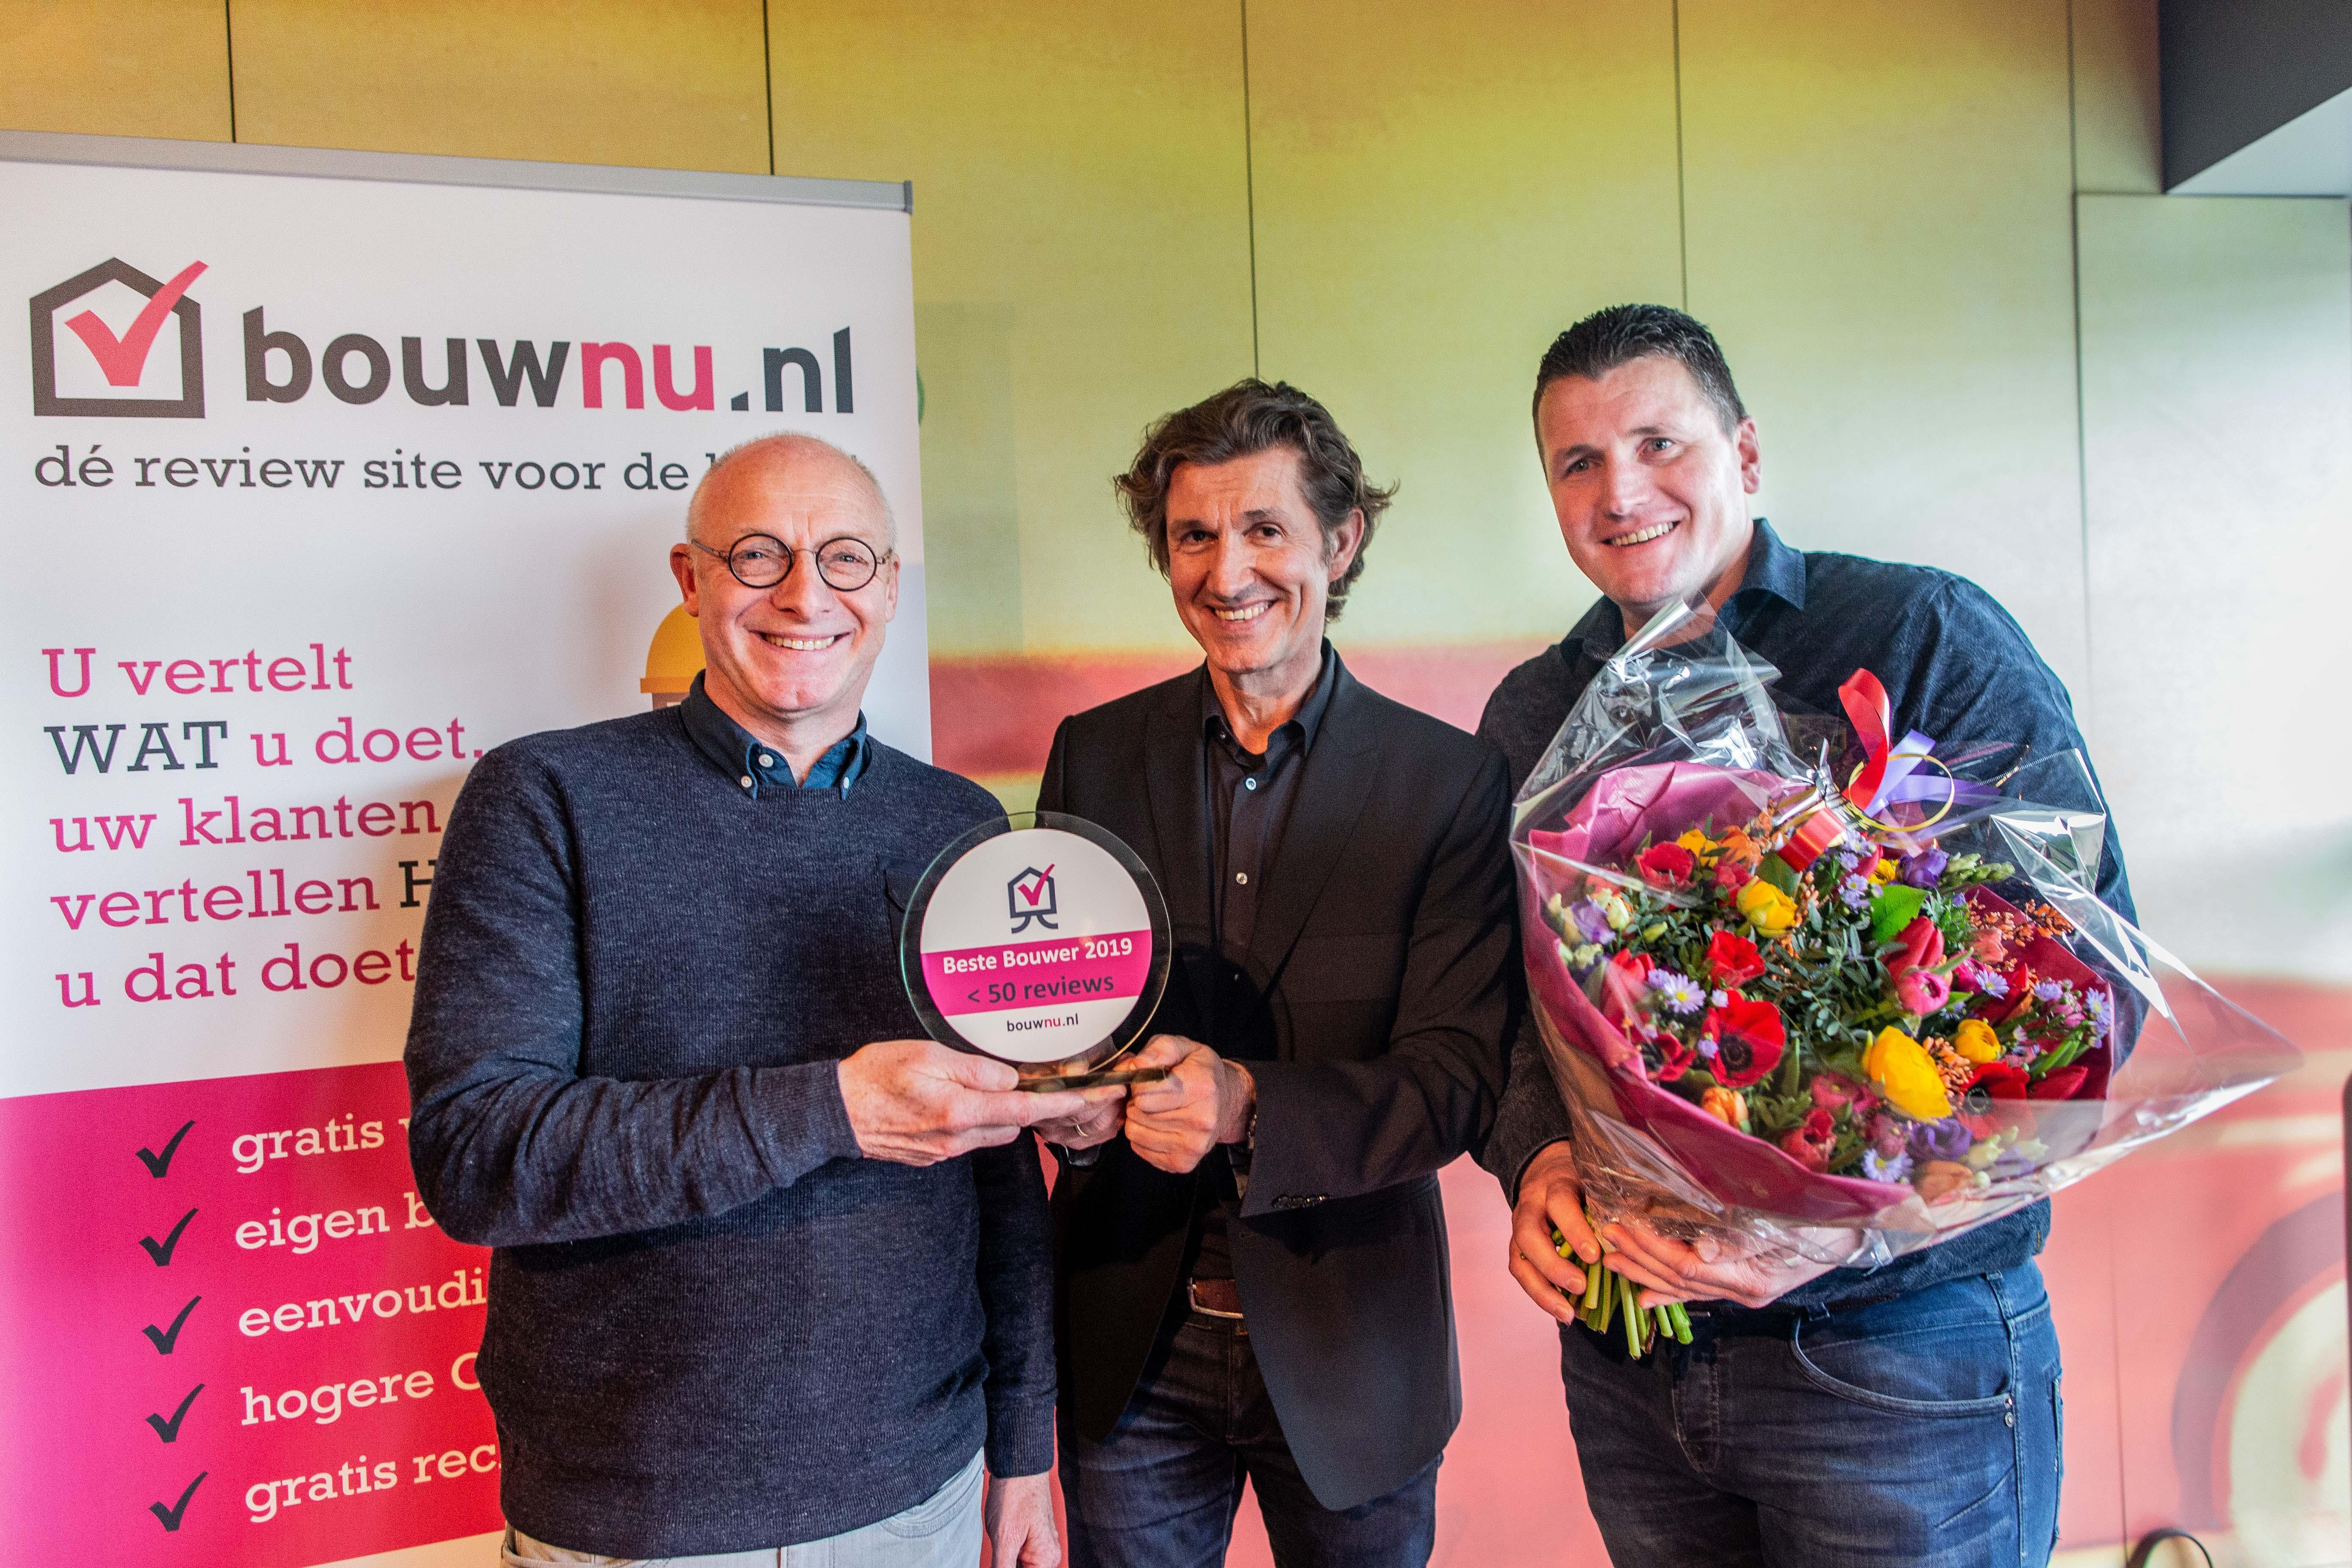 Kuipers & Koers Bouw